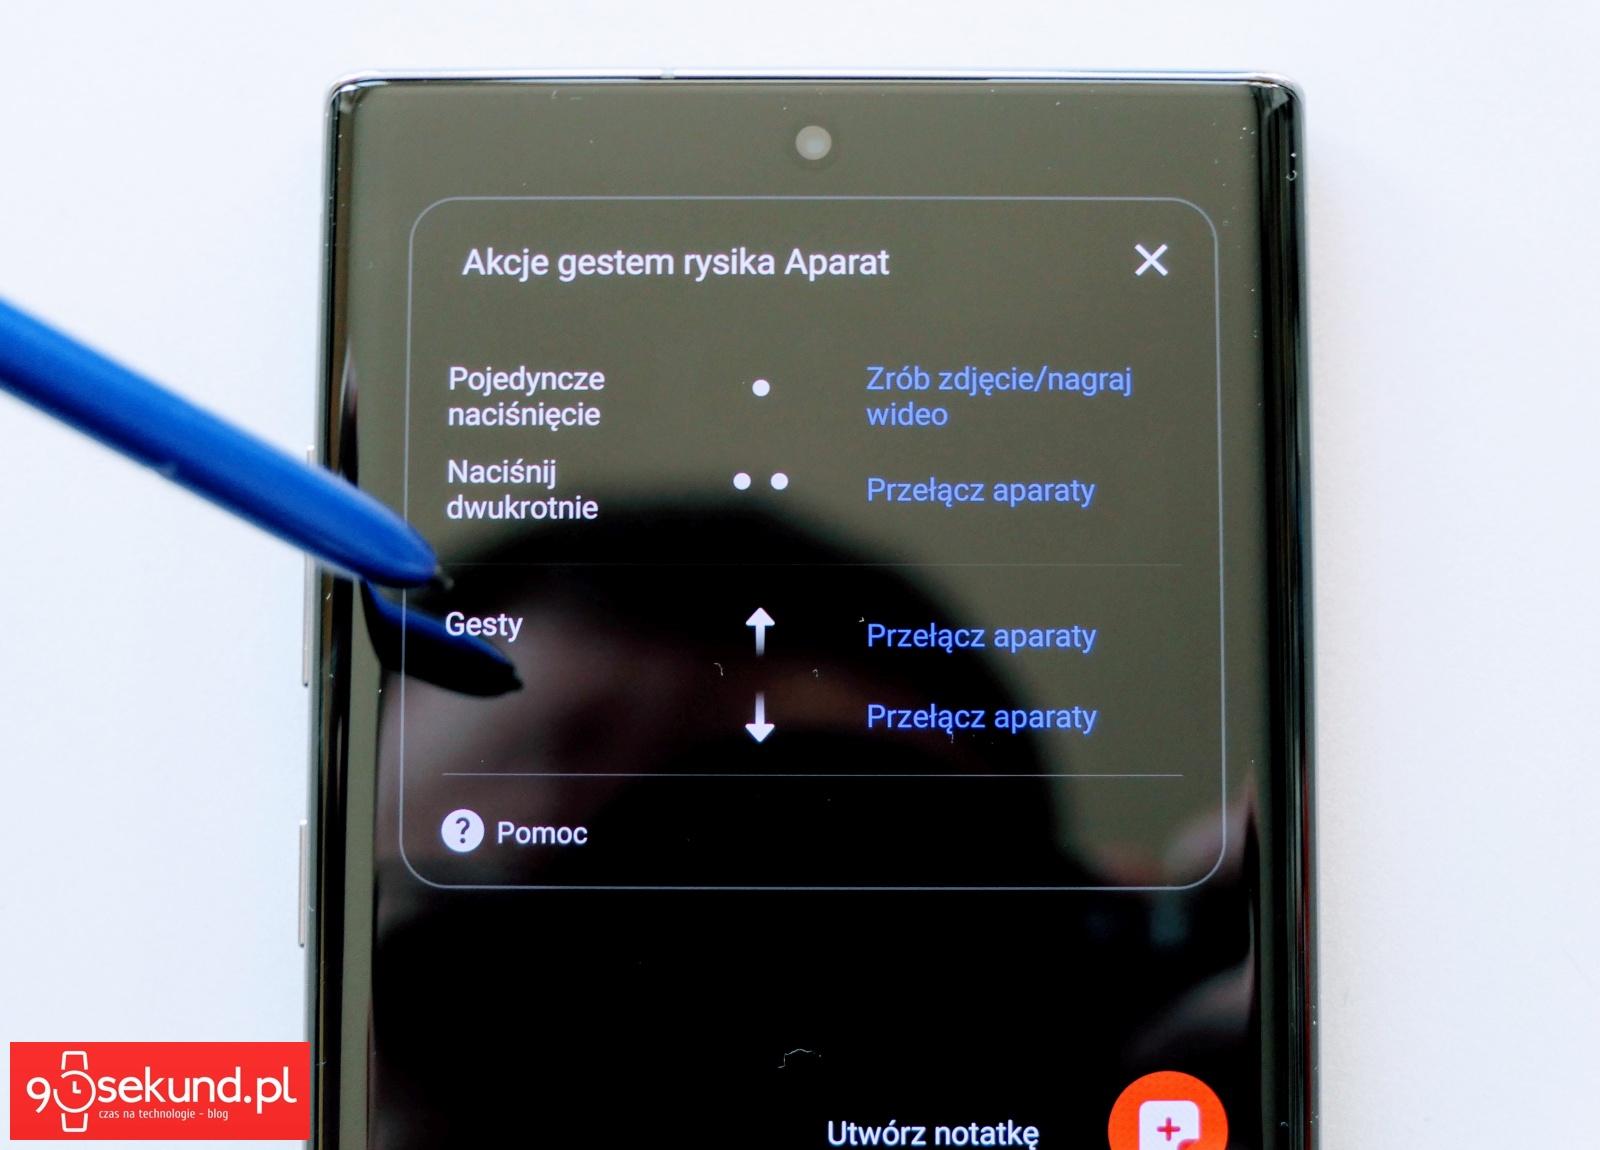 Samsung Galaxy Note 10+ - Michał Brożyński - 90sekund.pl